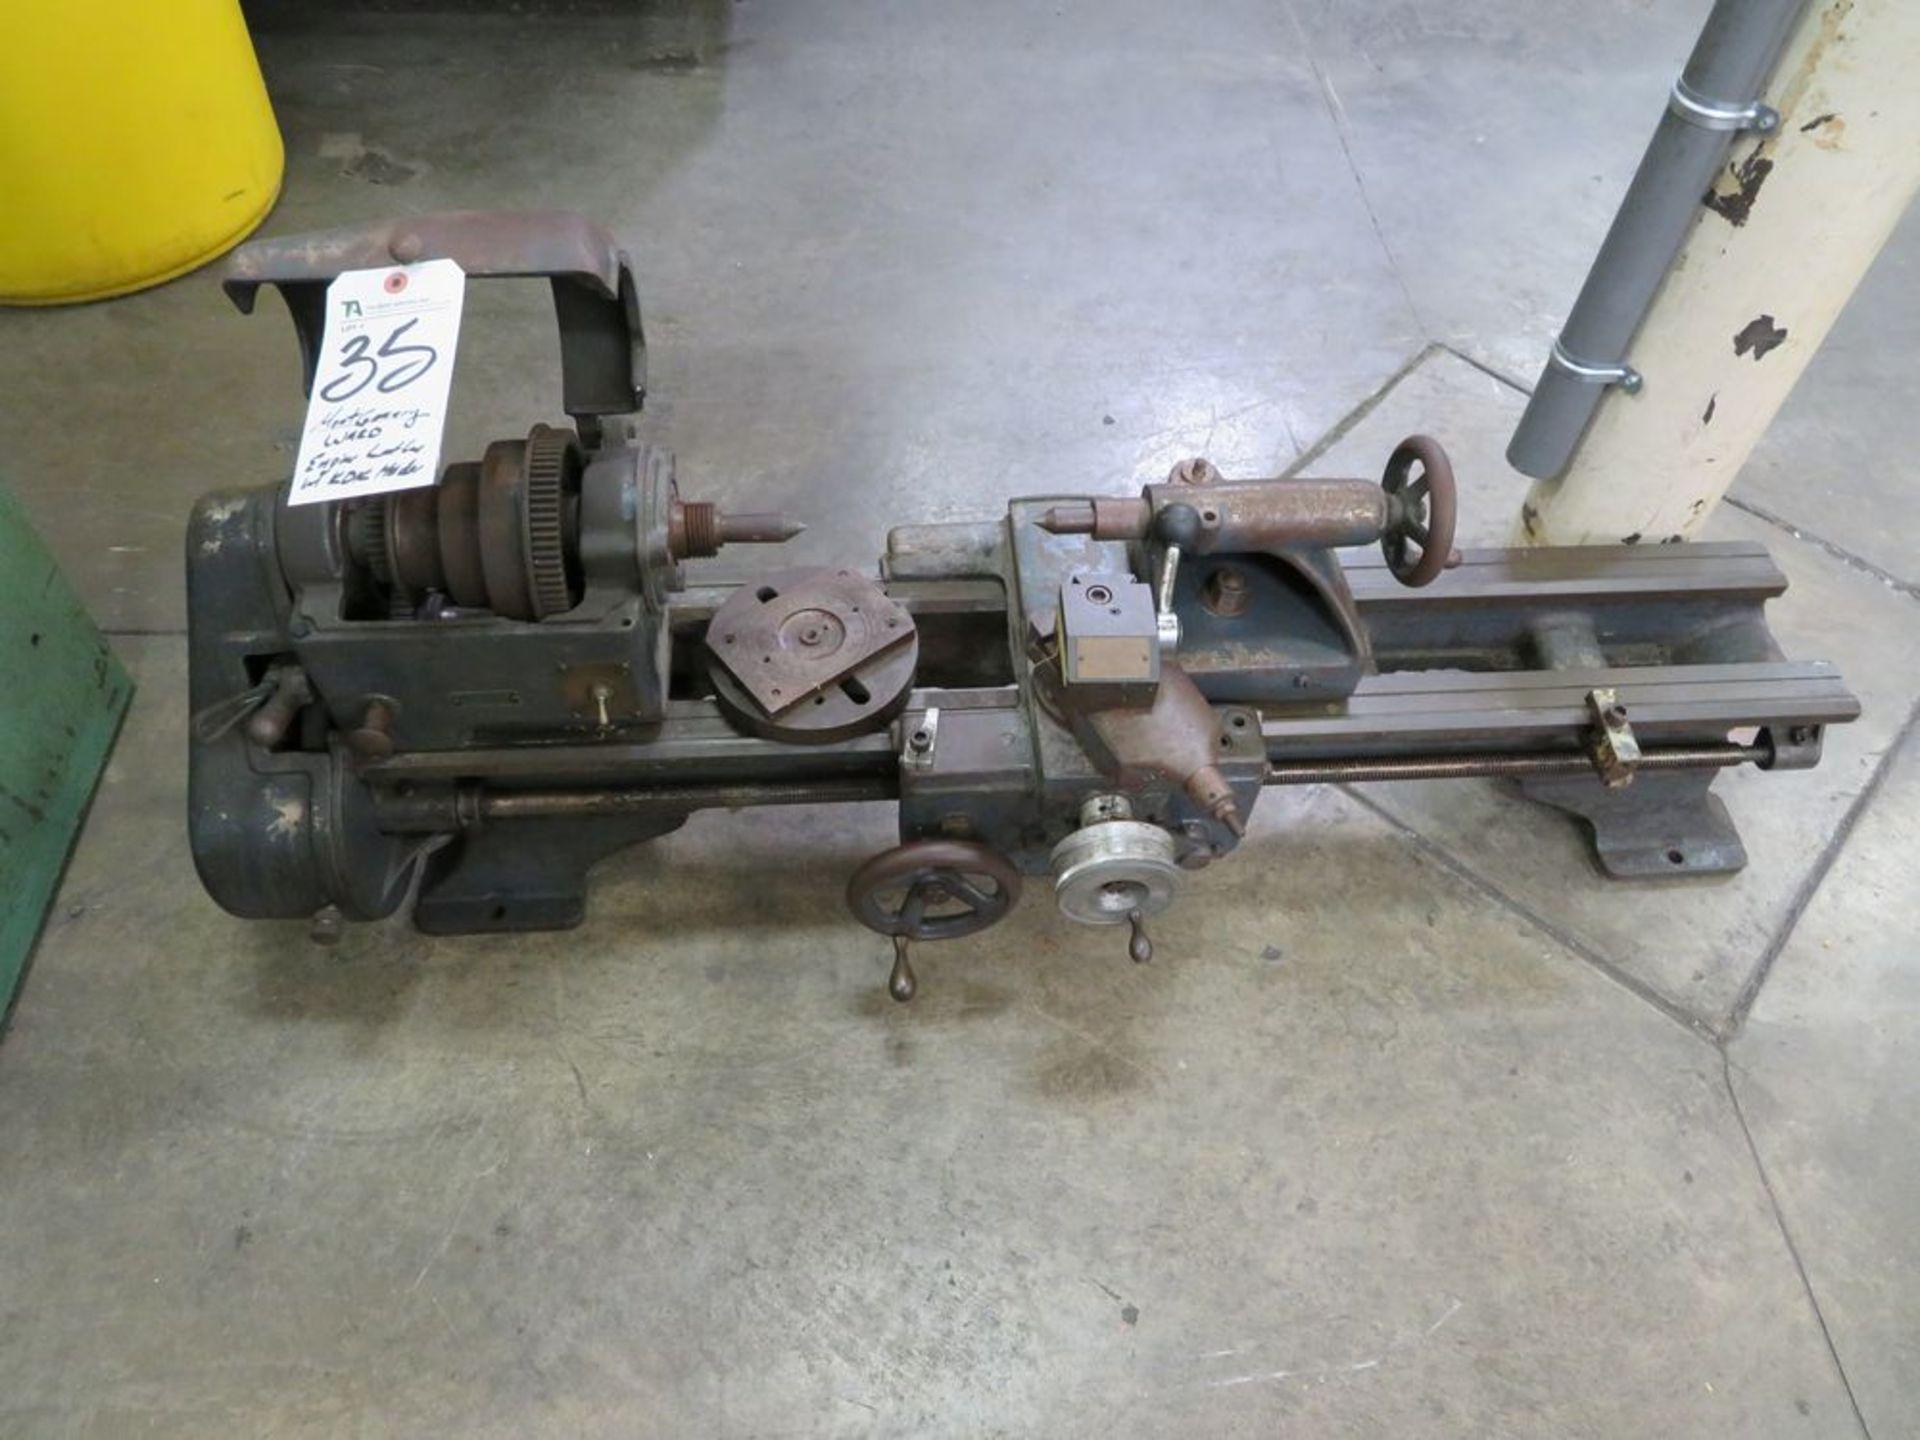 Lot 35 - Montgomery Ward Engine Lathe w/ KDK Holder